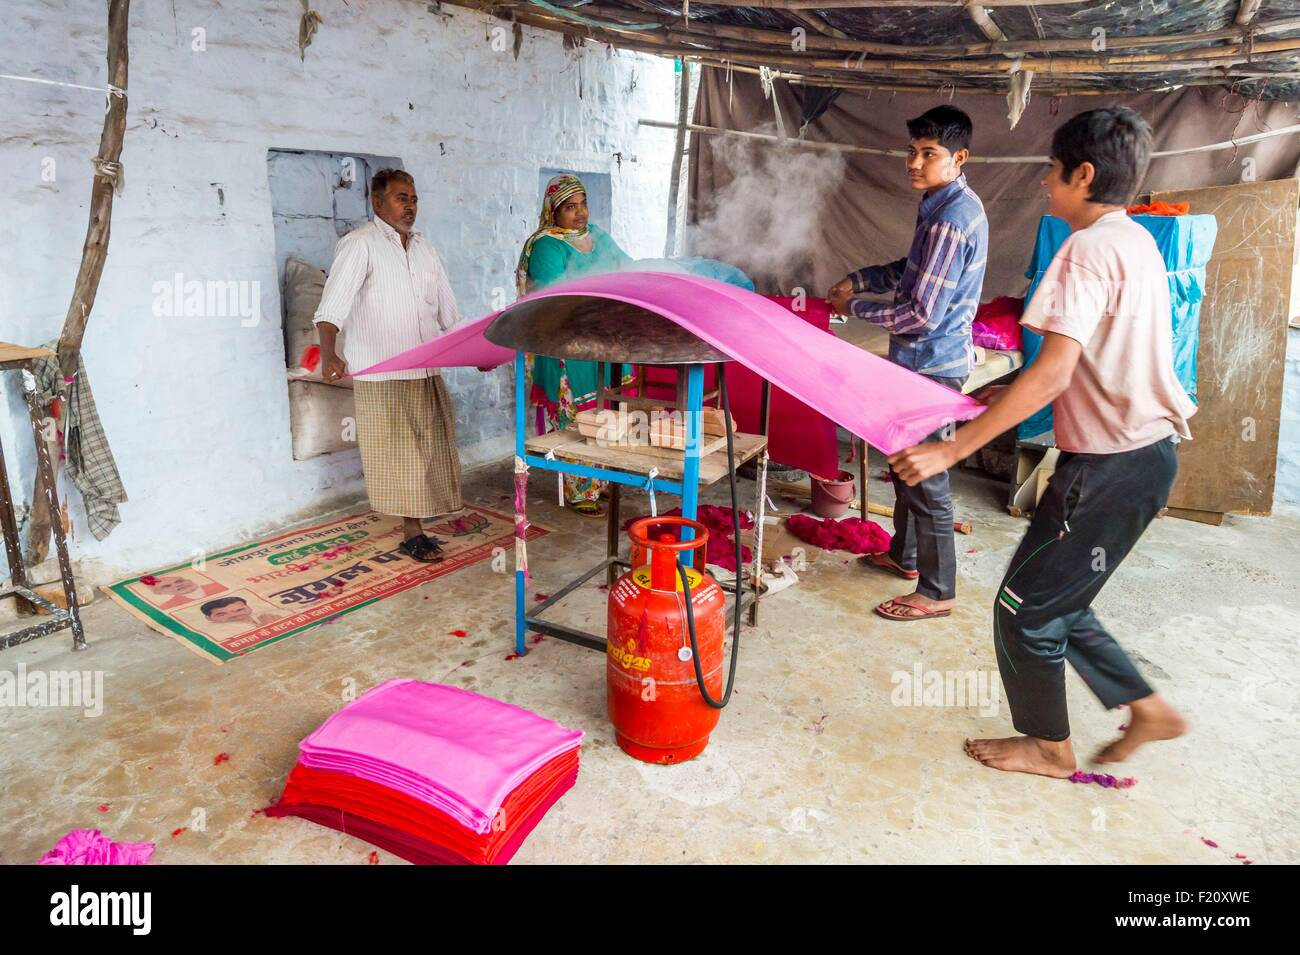 India Rajasthan, Jodhpur, l'area morente Immagini Stock